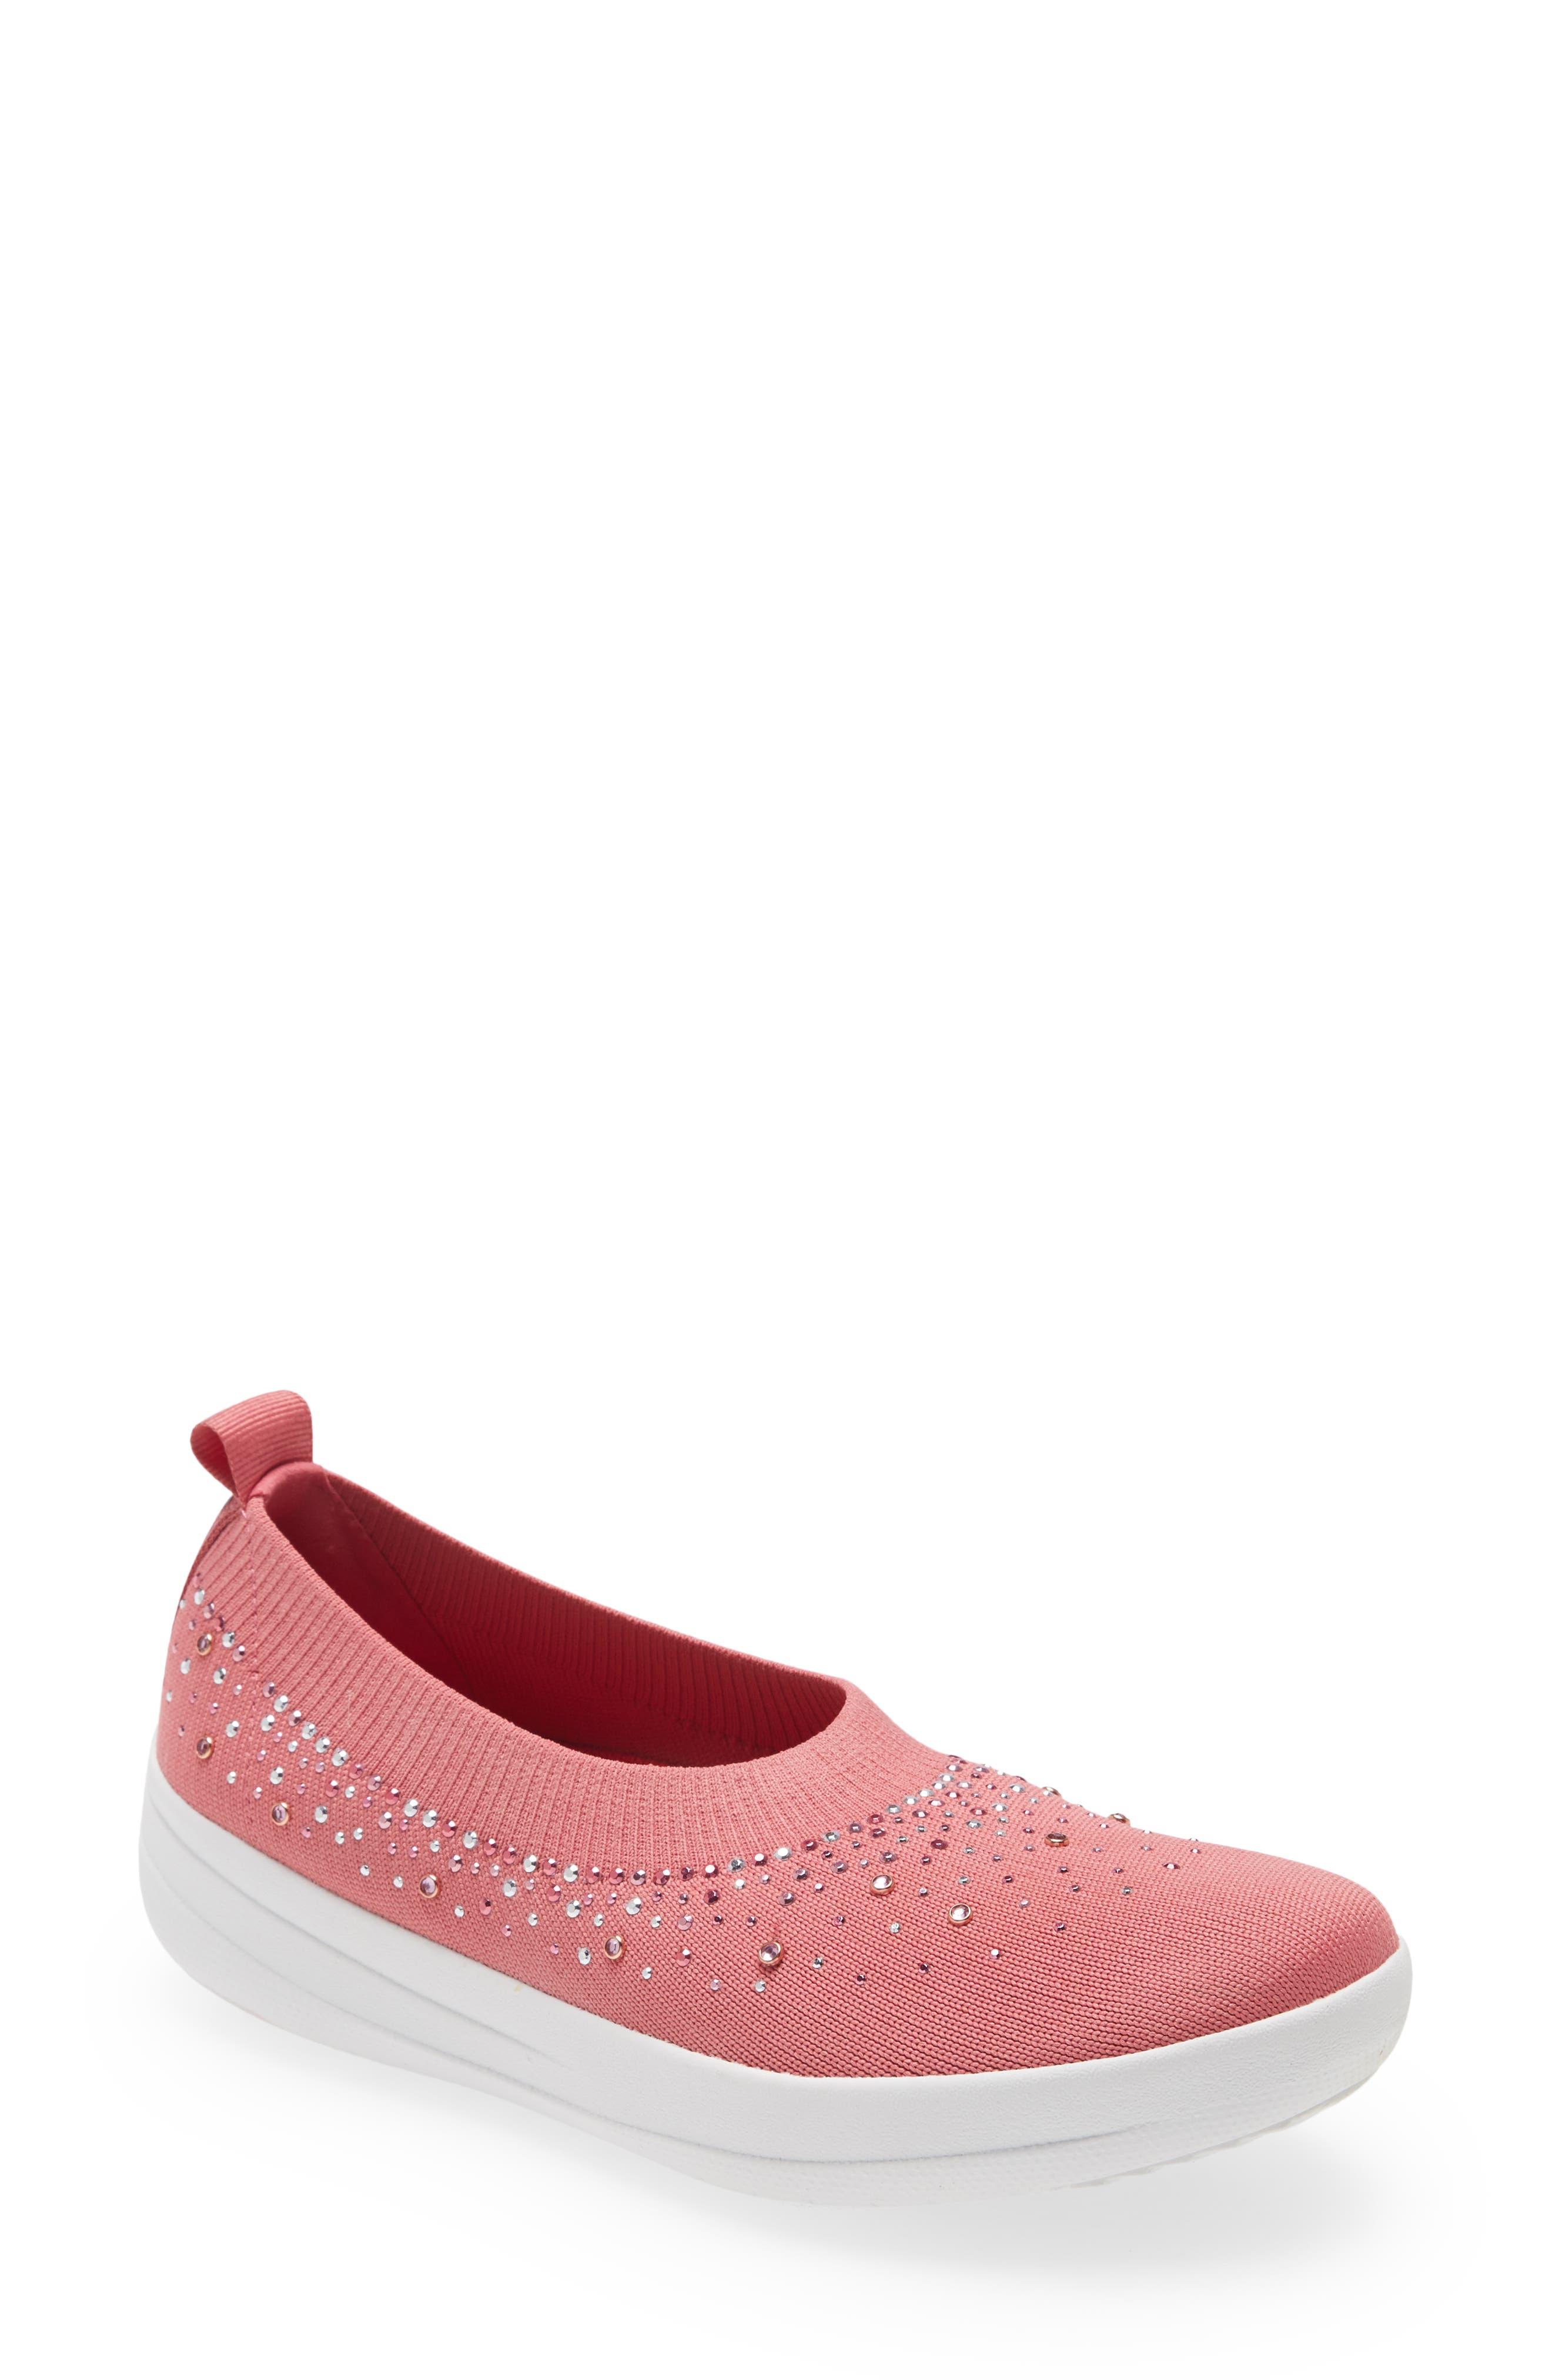 Uberknit(TM) Crystal Ballerina Slip-On Sneaker